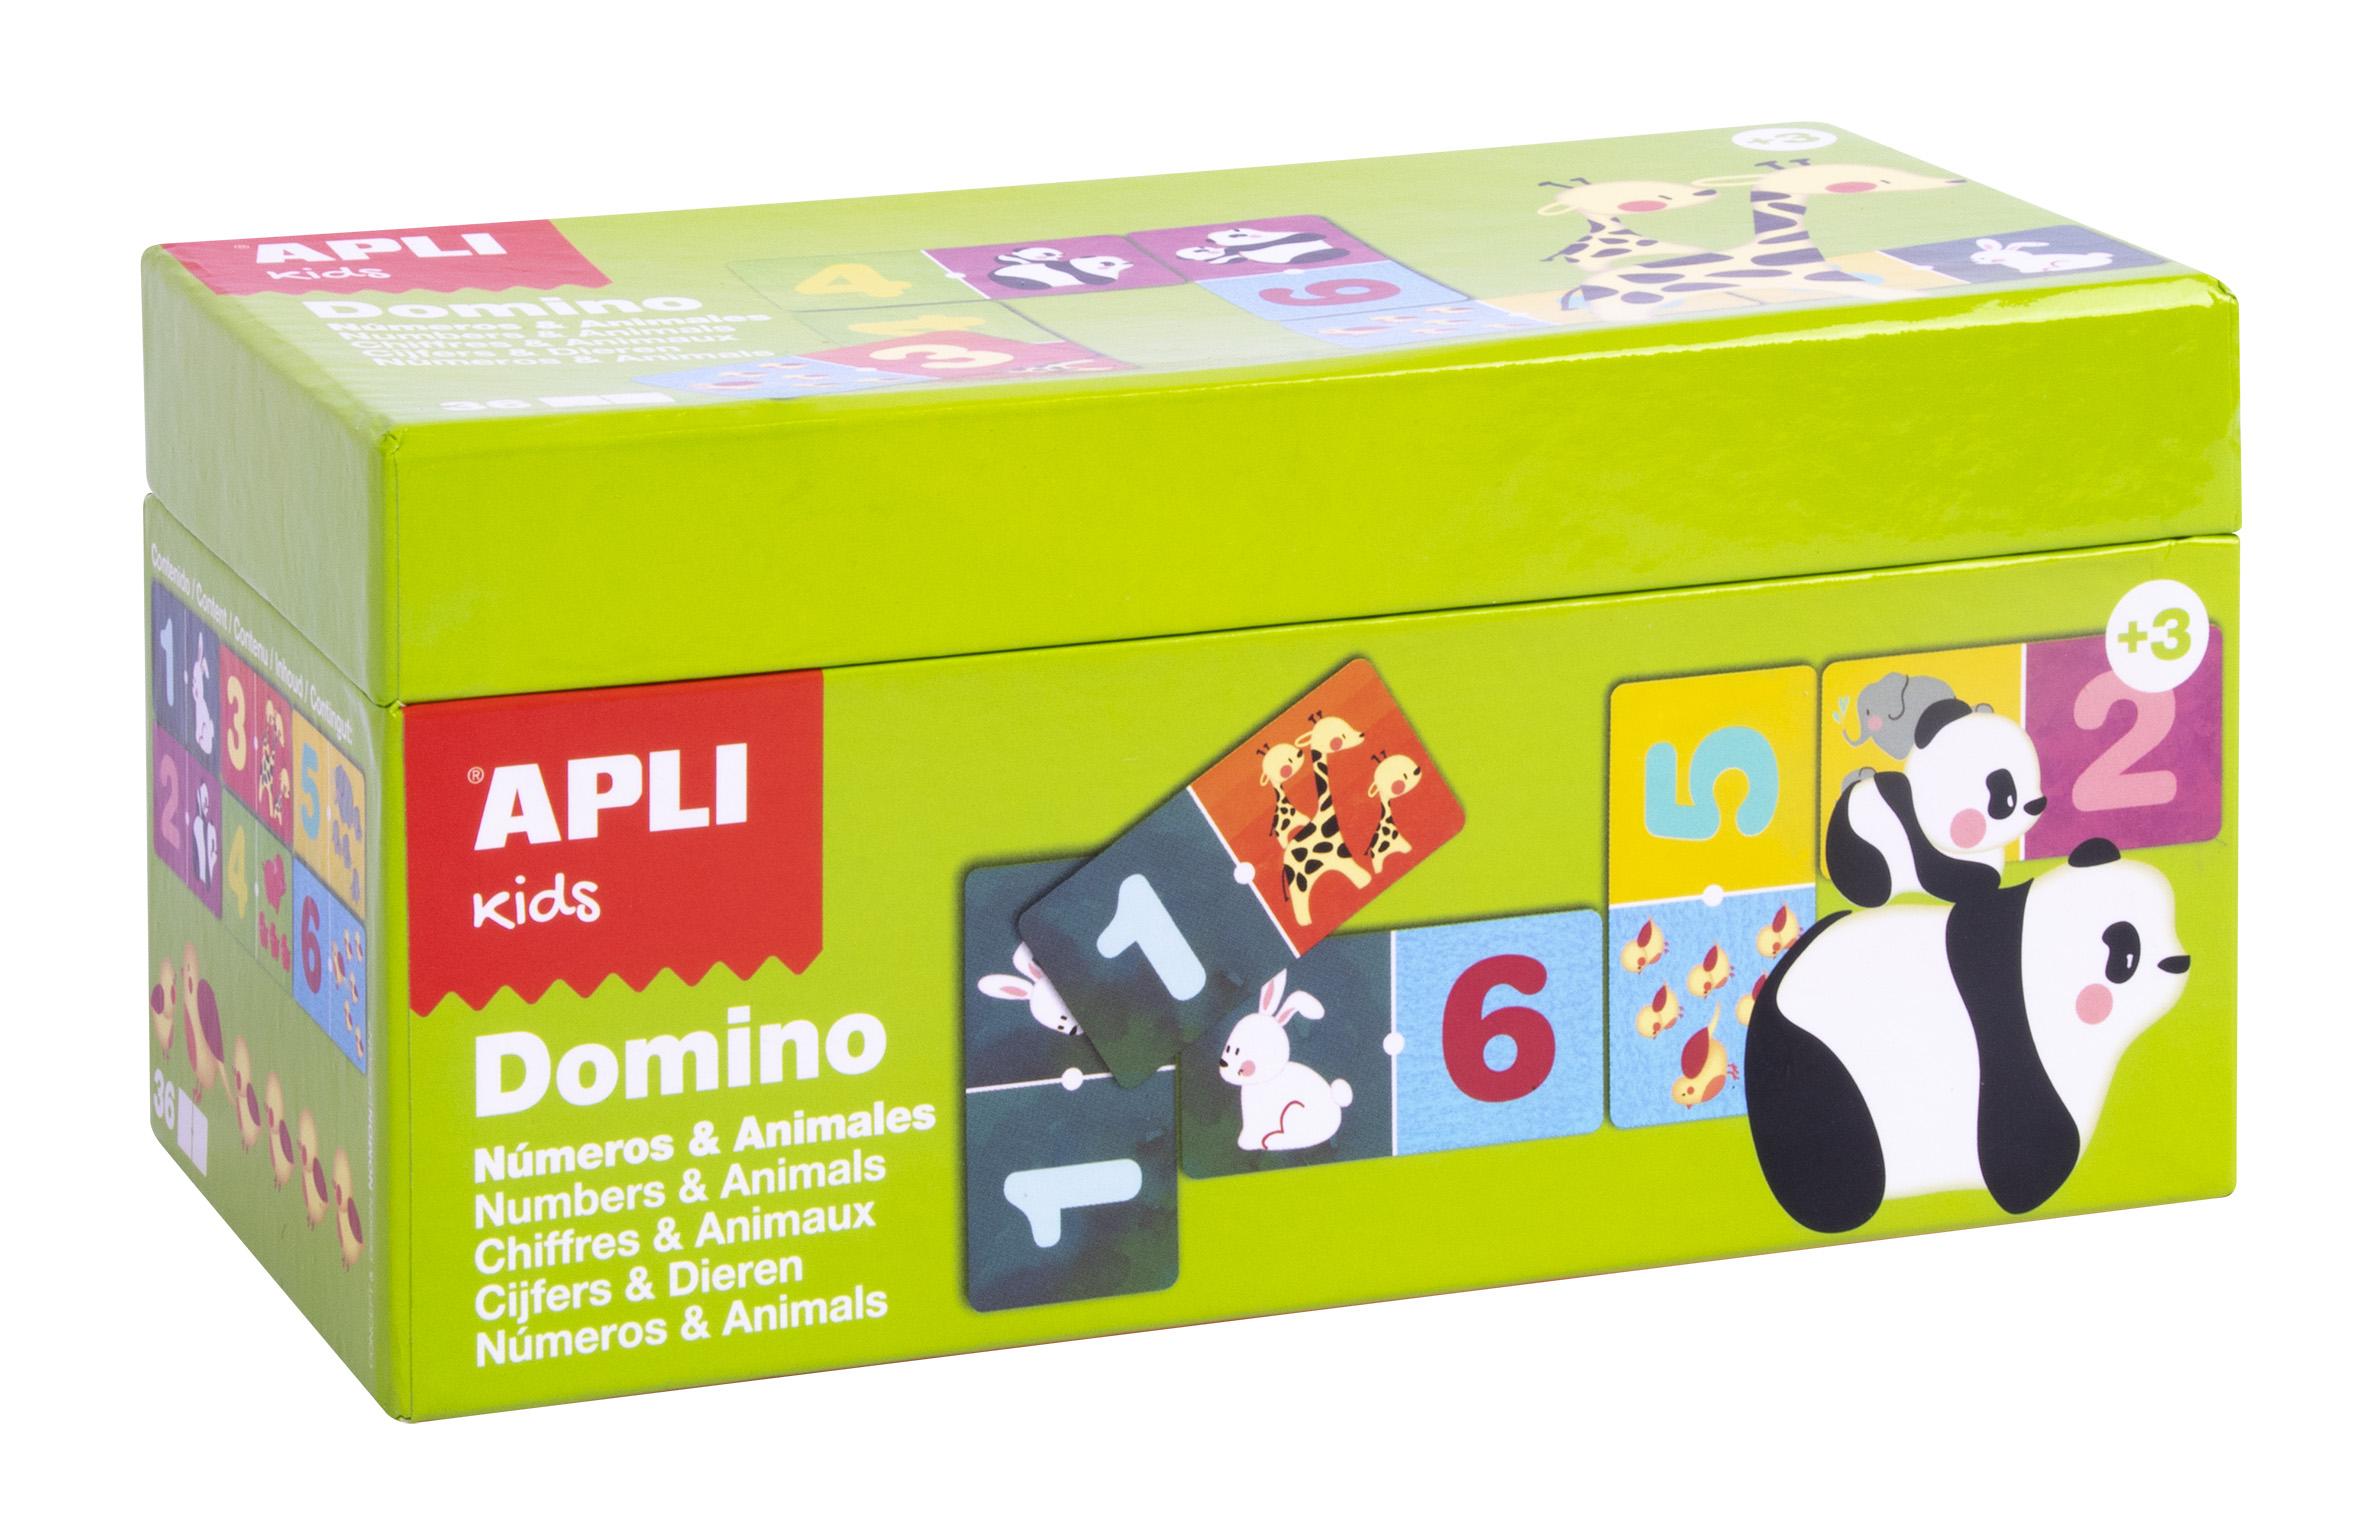 Joc domino cu 36 de piese - Numere și animale imagine edituradiana.ro